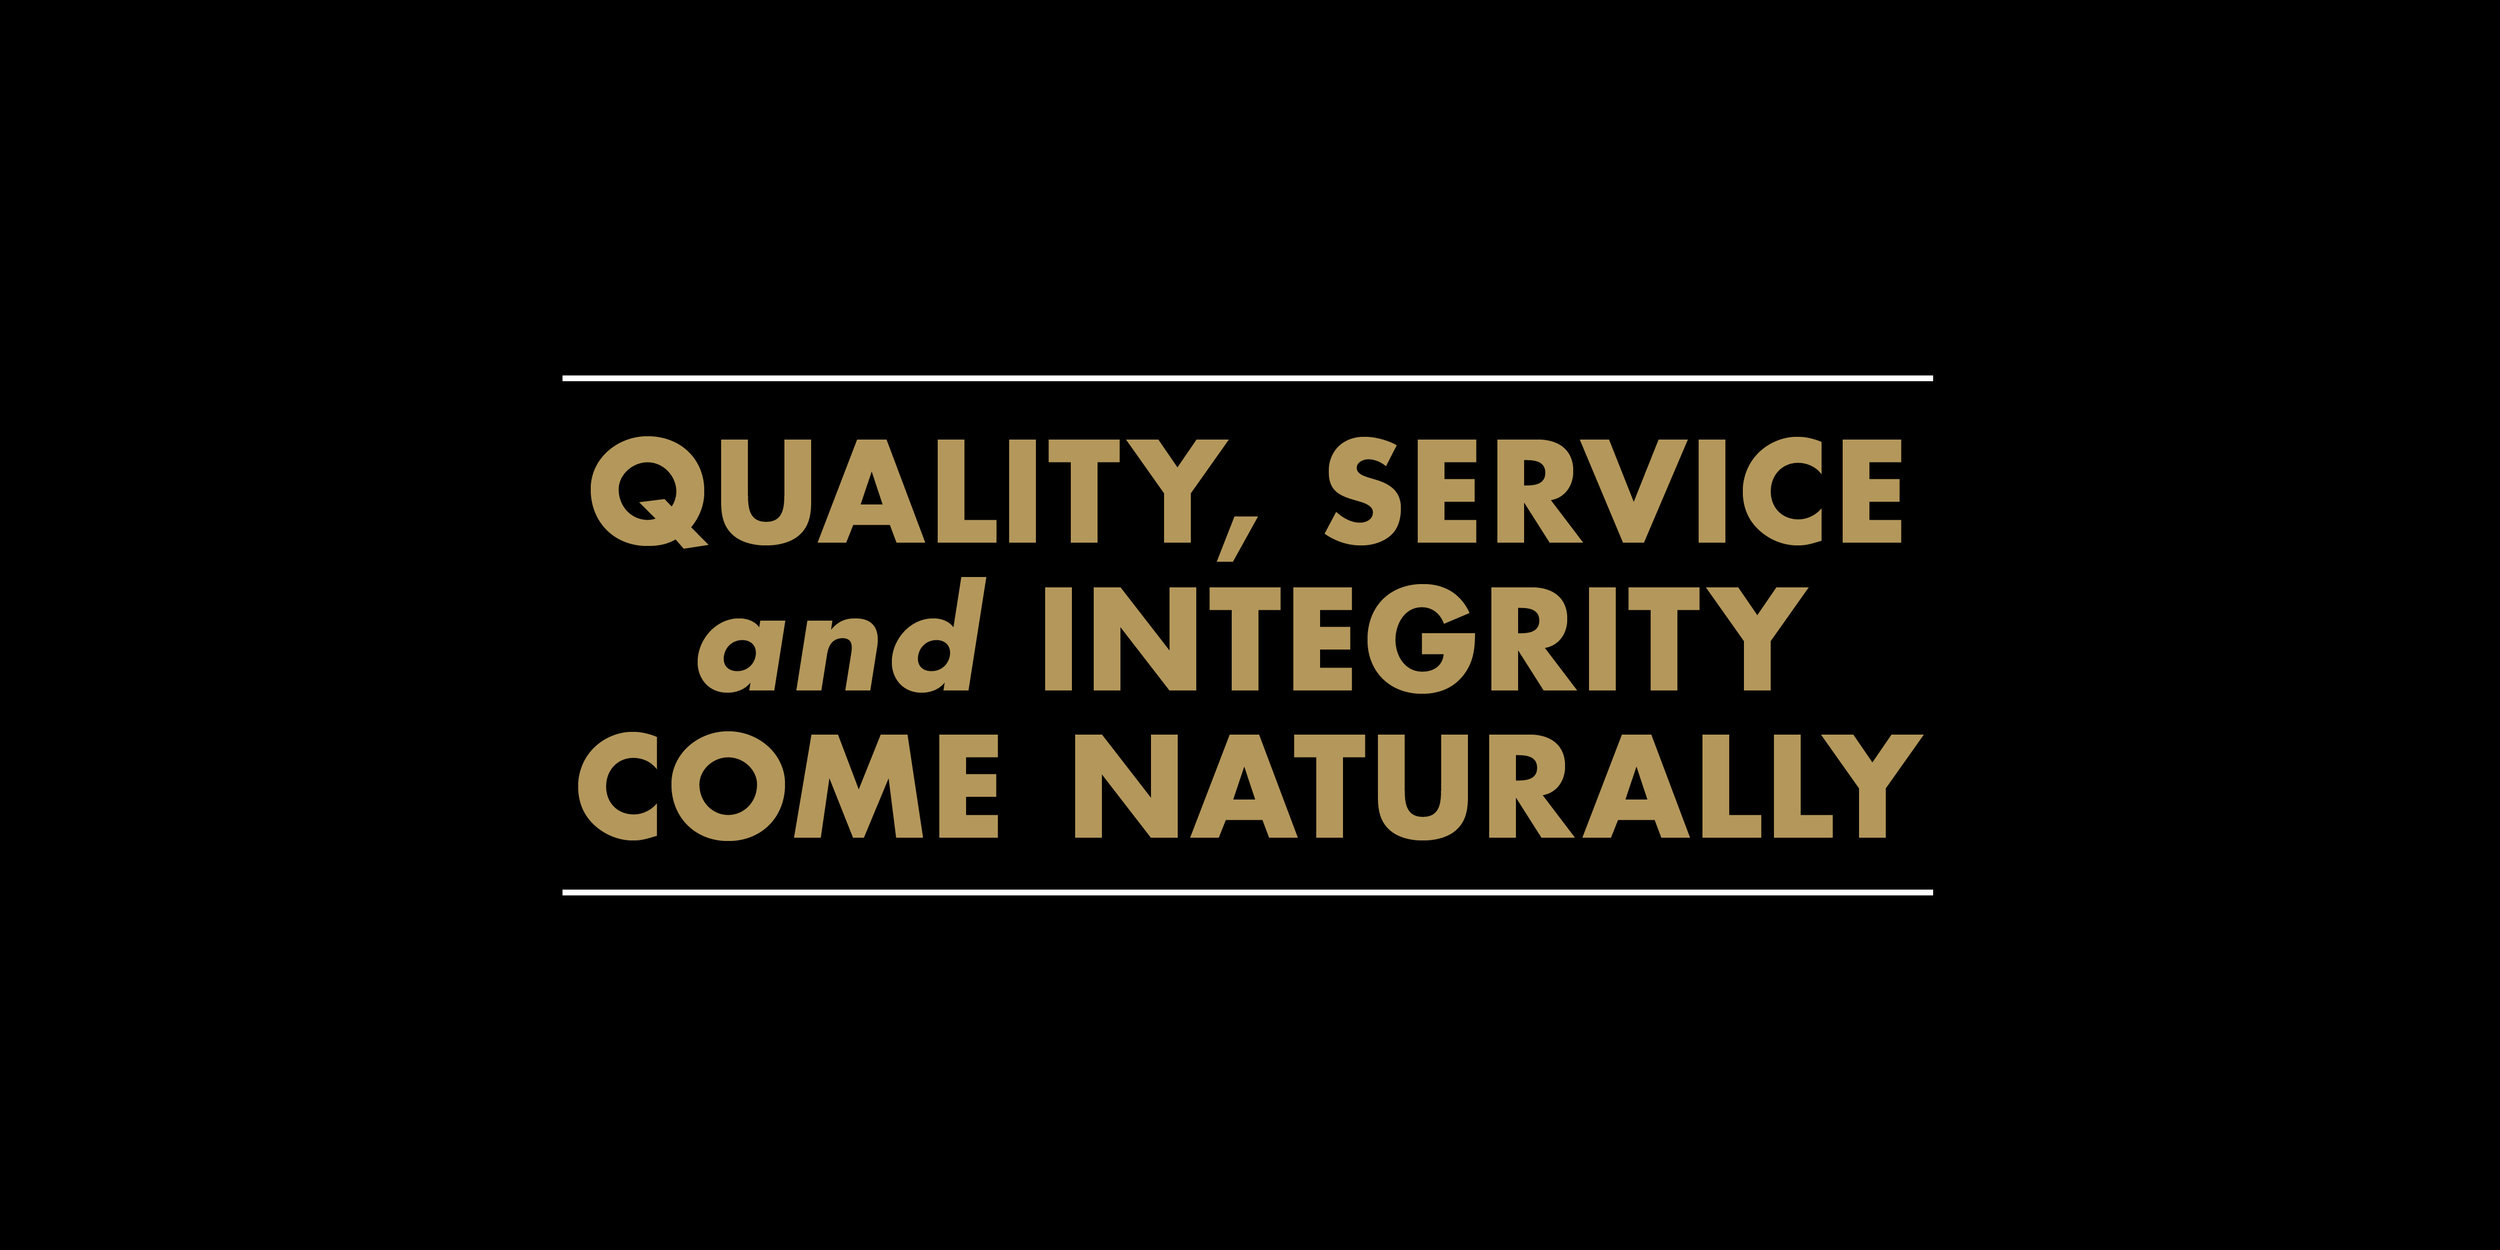 QualityServiceIntegrity-Graphic.jpg